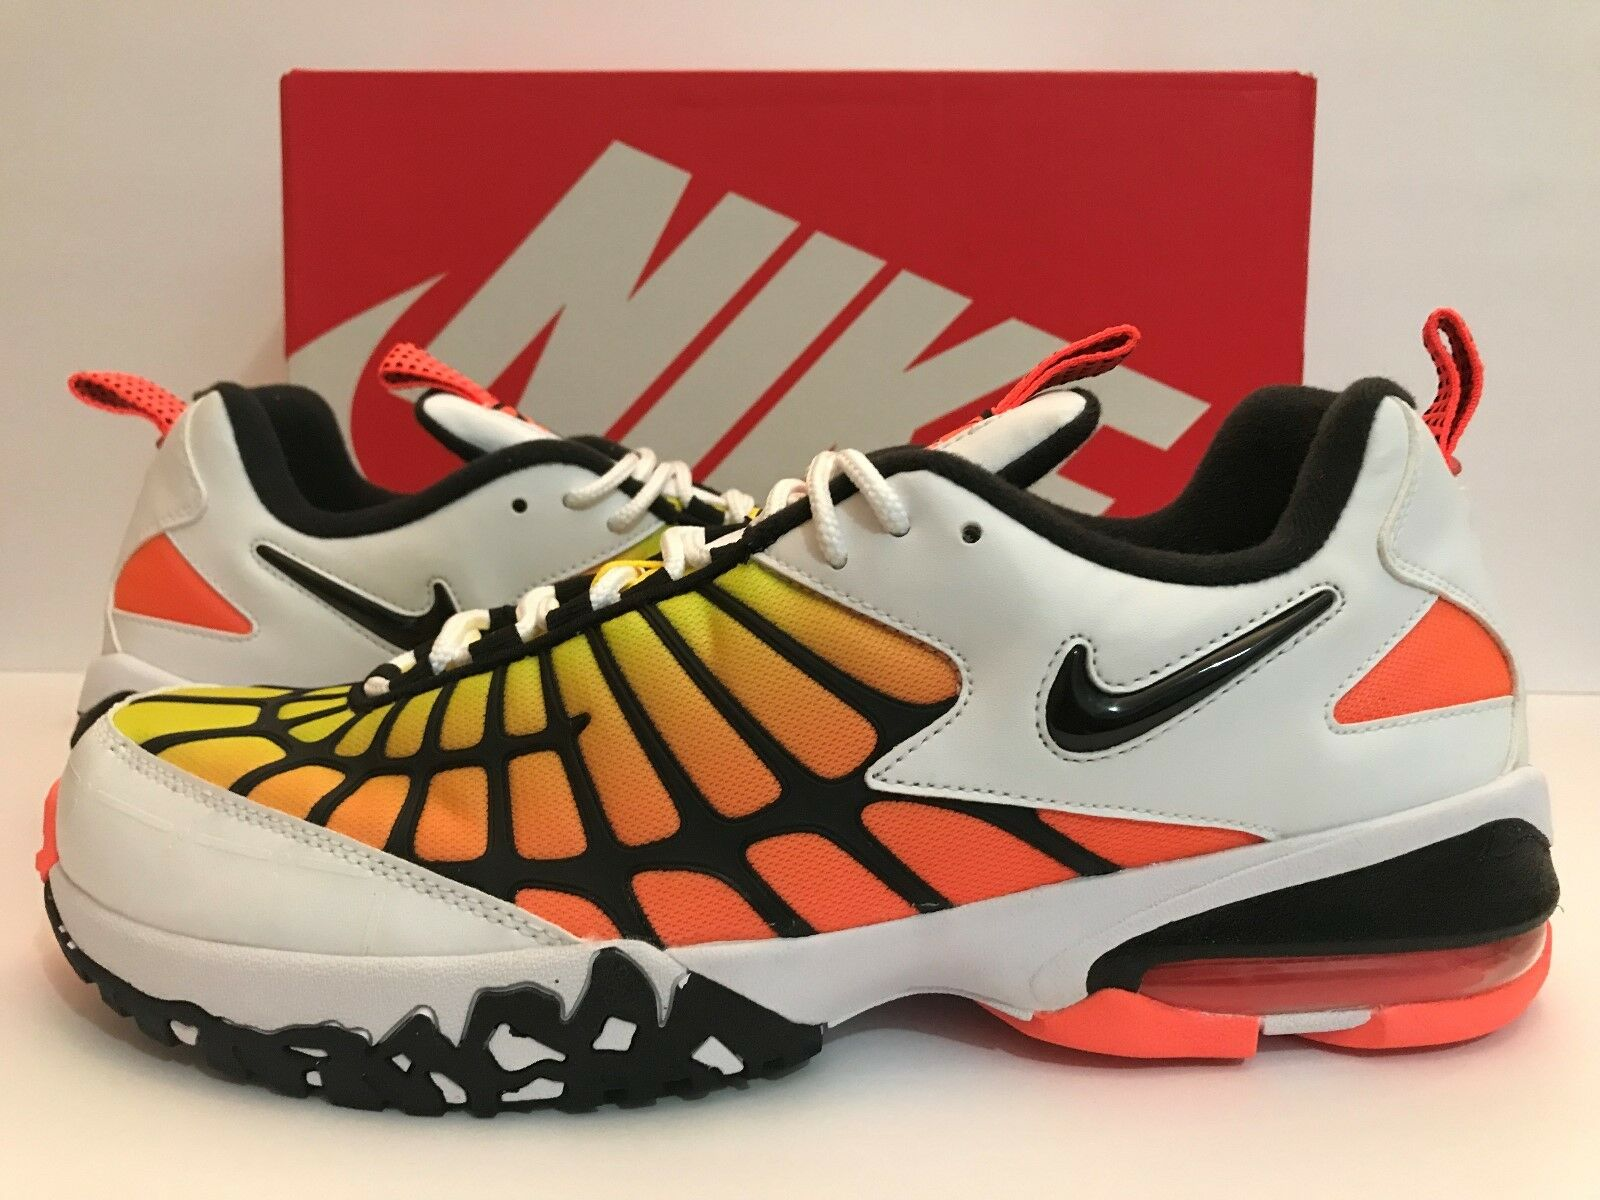 Nike Air Max 120 OG 819857-100 Sz 12 best-selling model of the brand